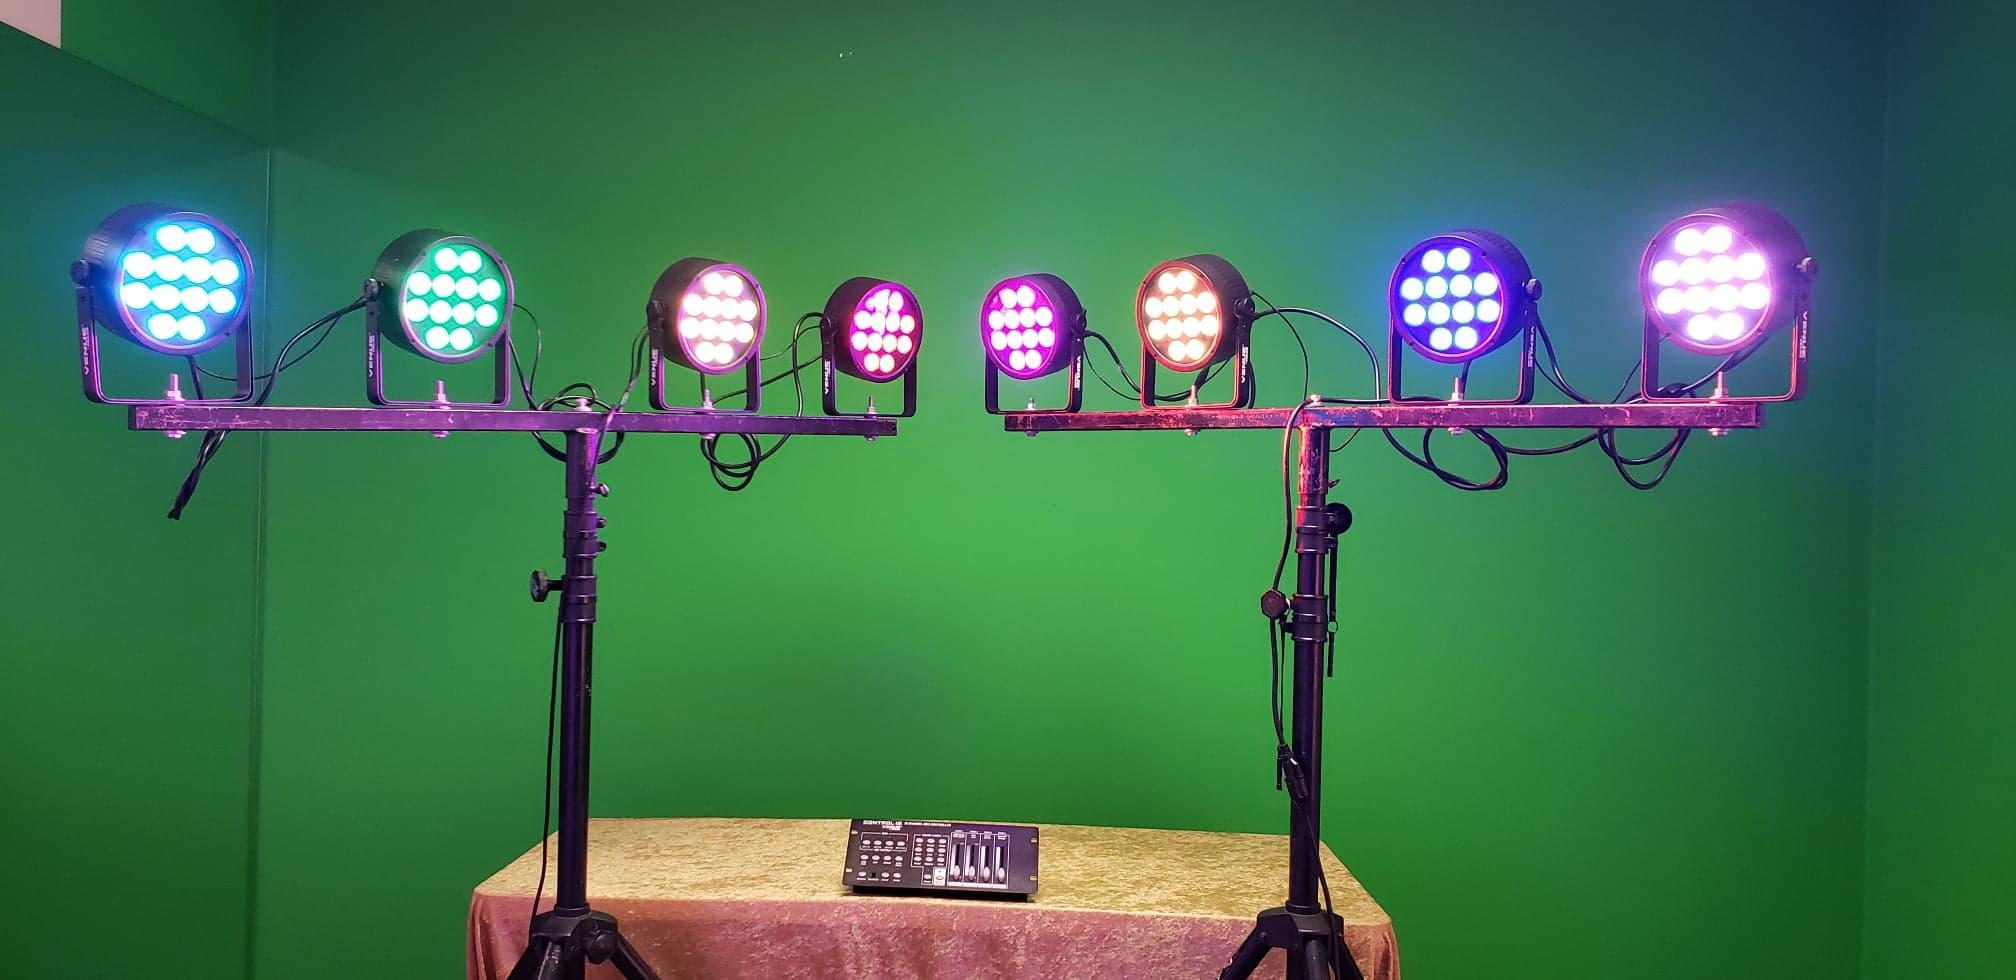 lighting equipment party lighting rentals los angeles stage uplight. Black Bedroom Furniture Sets. Home Design Ideas